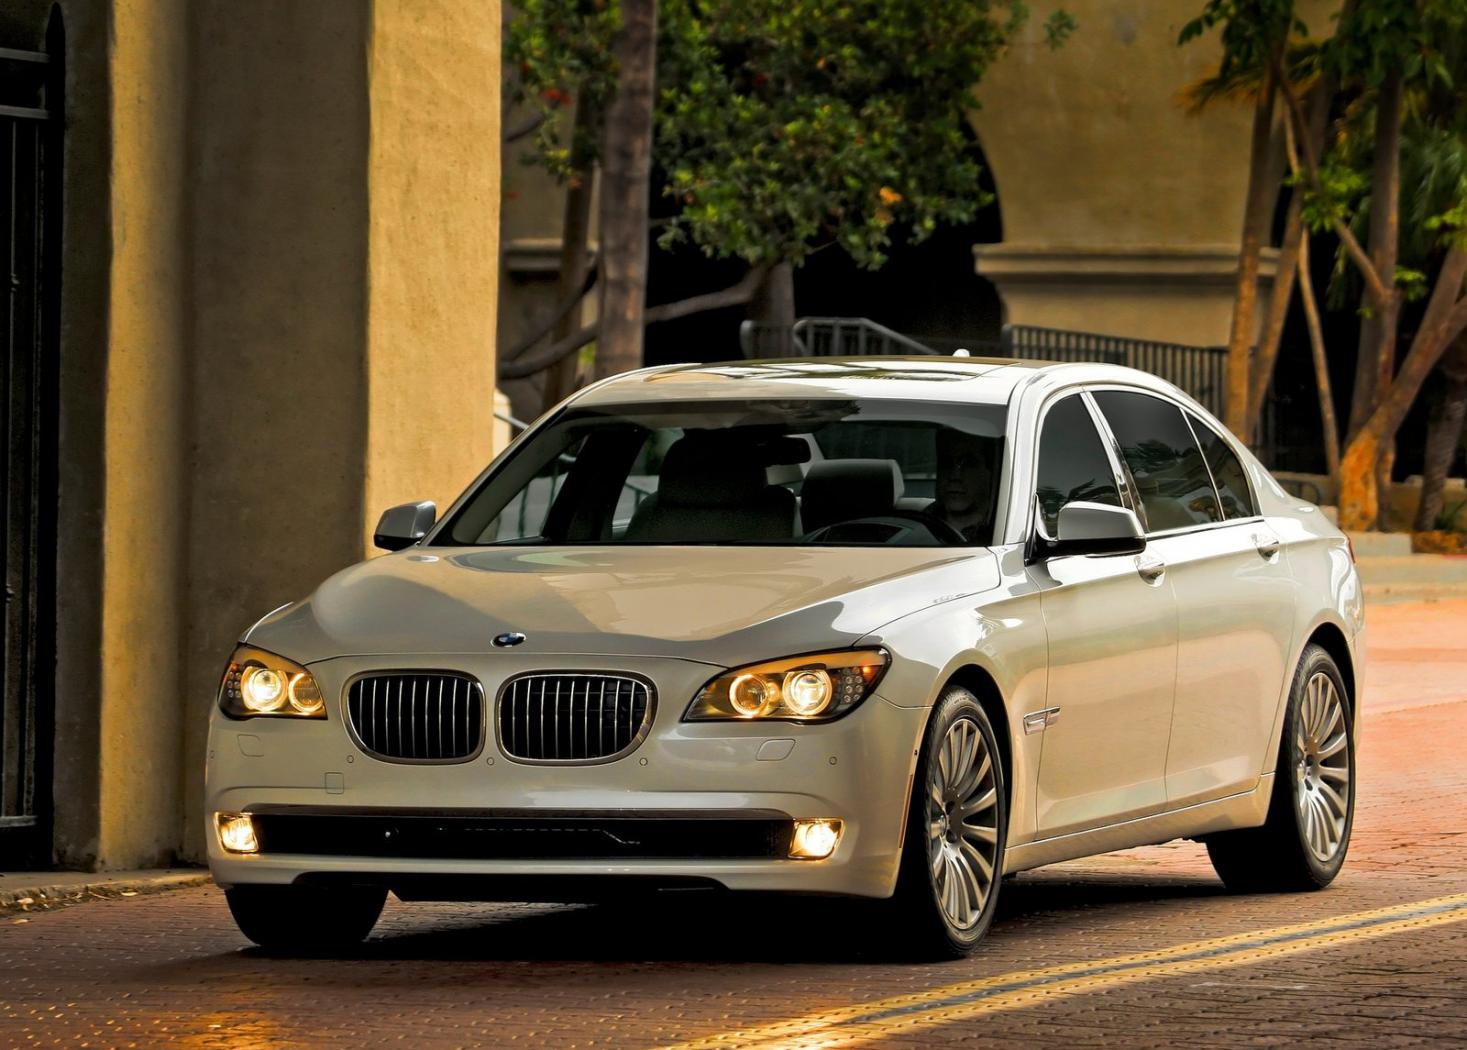 BMW-Serie-7-F01-7.jpeg